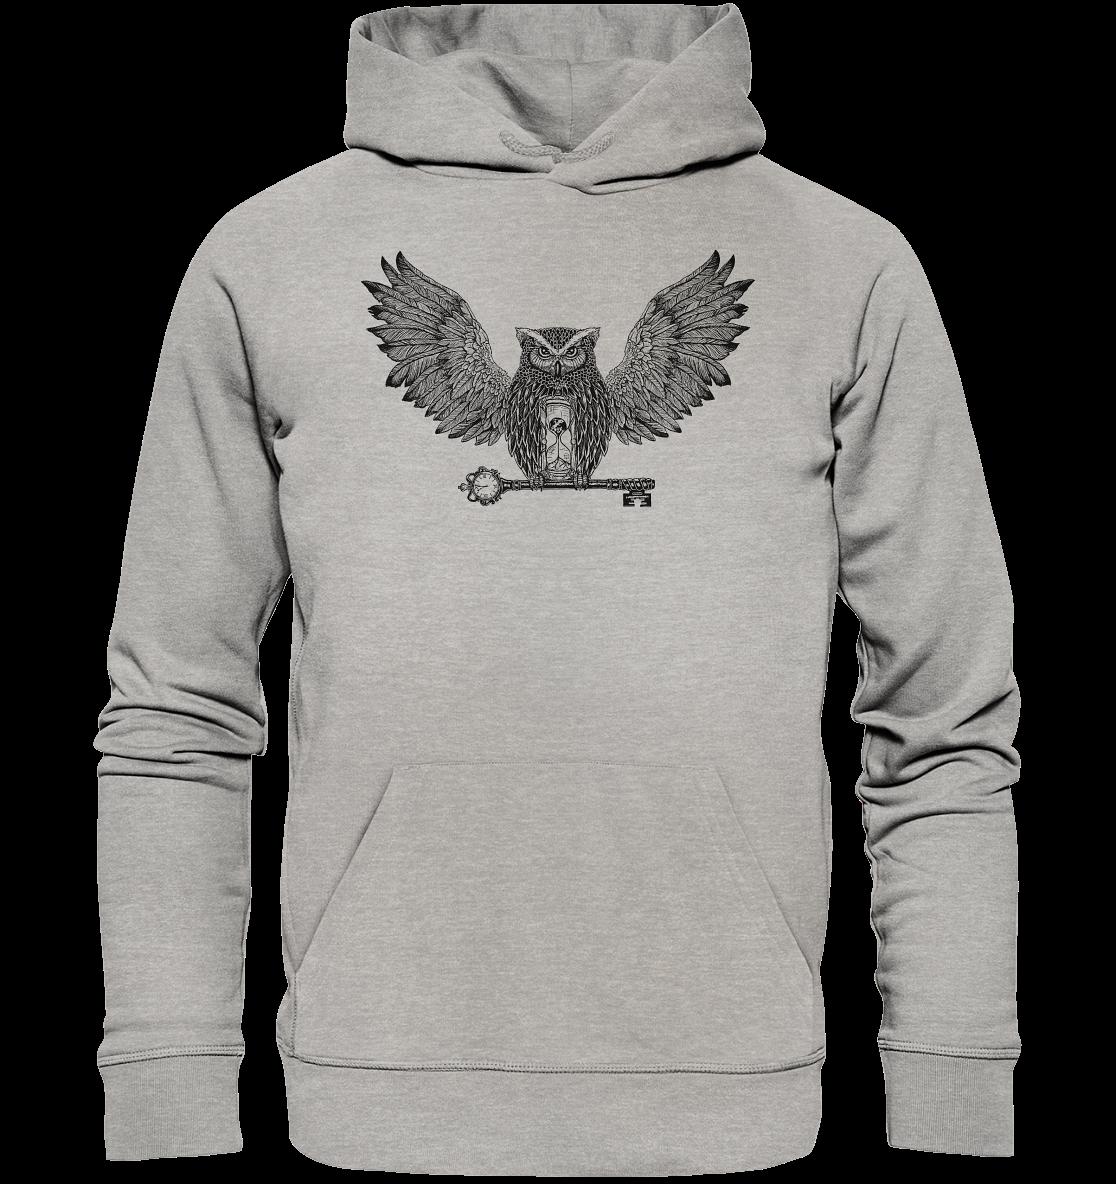 front-organic-hoodie-c2c1c0-1116x-5.png